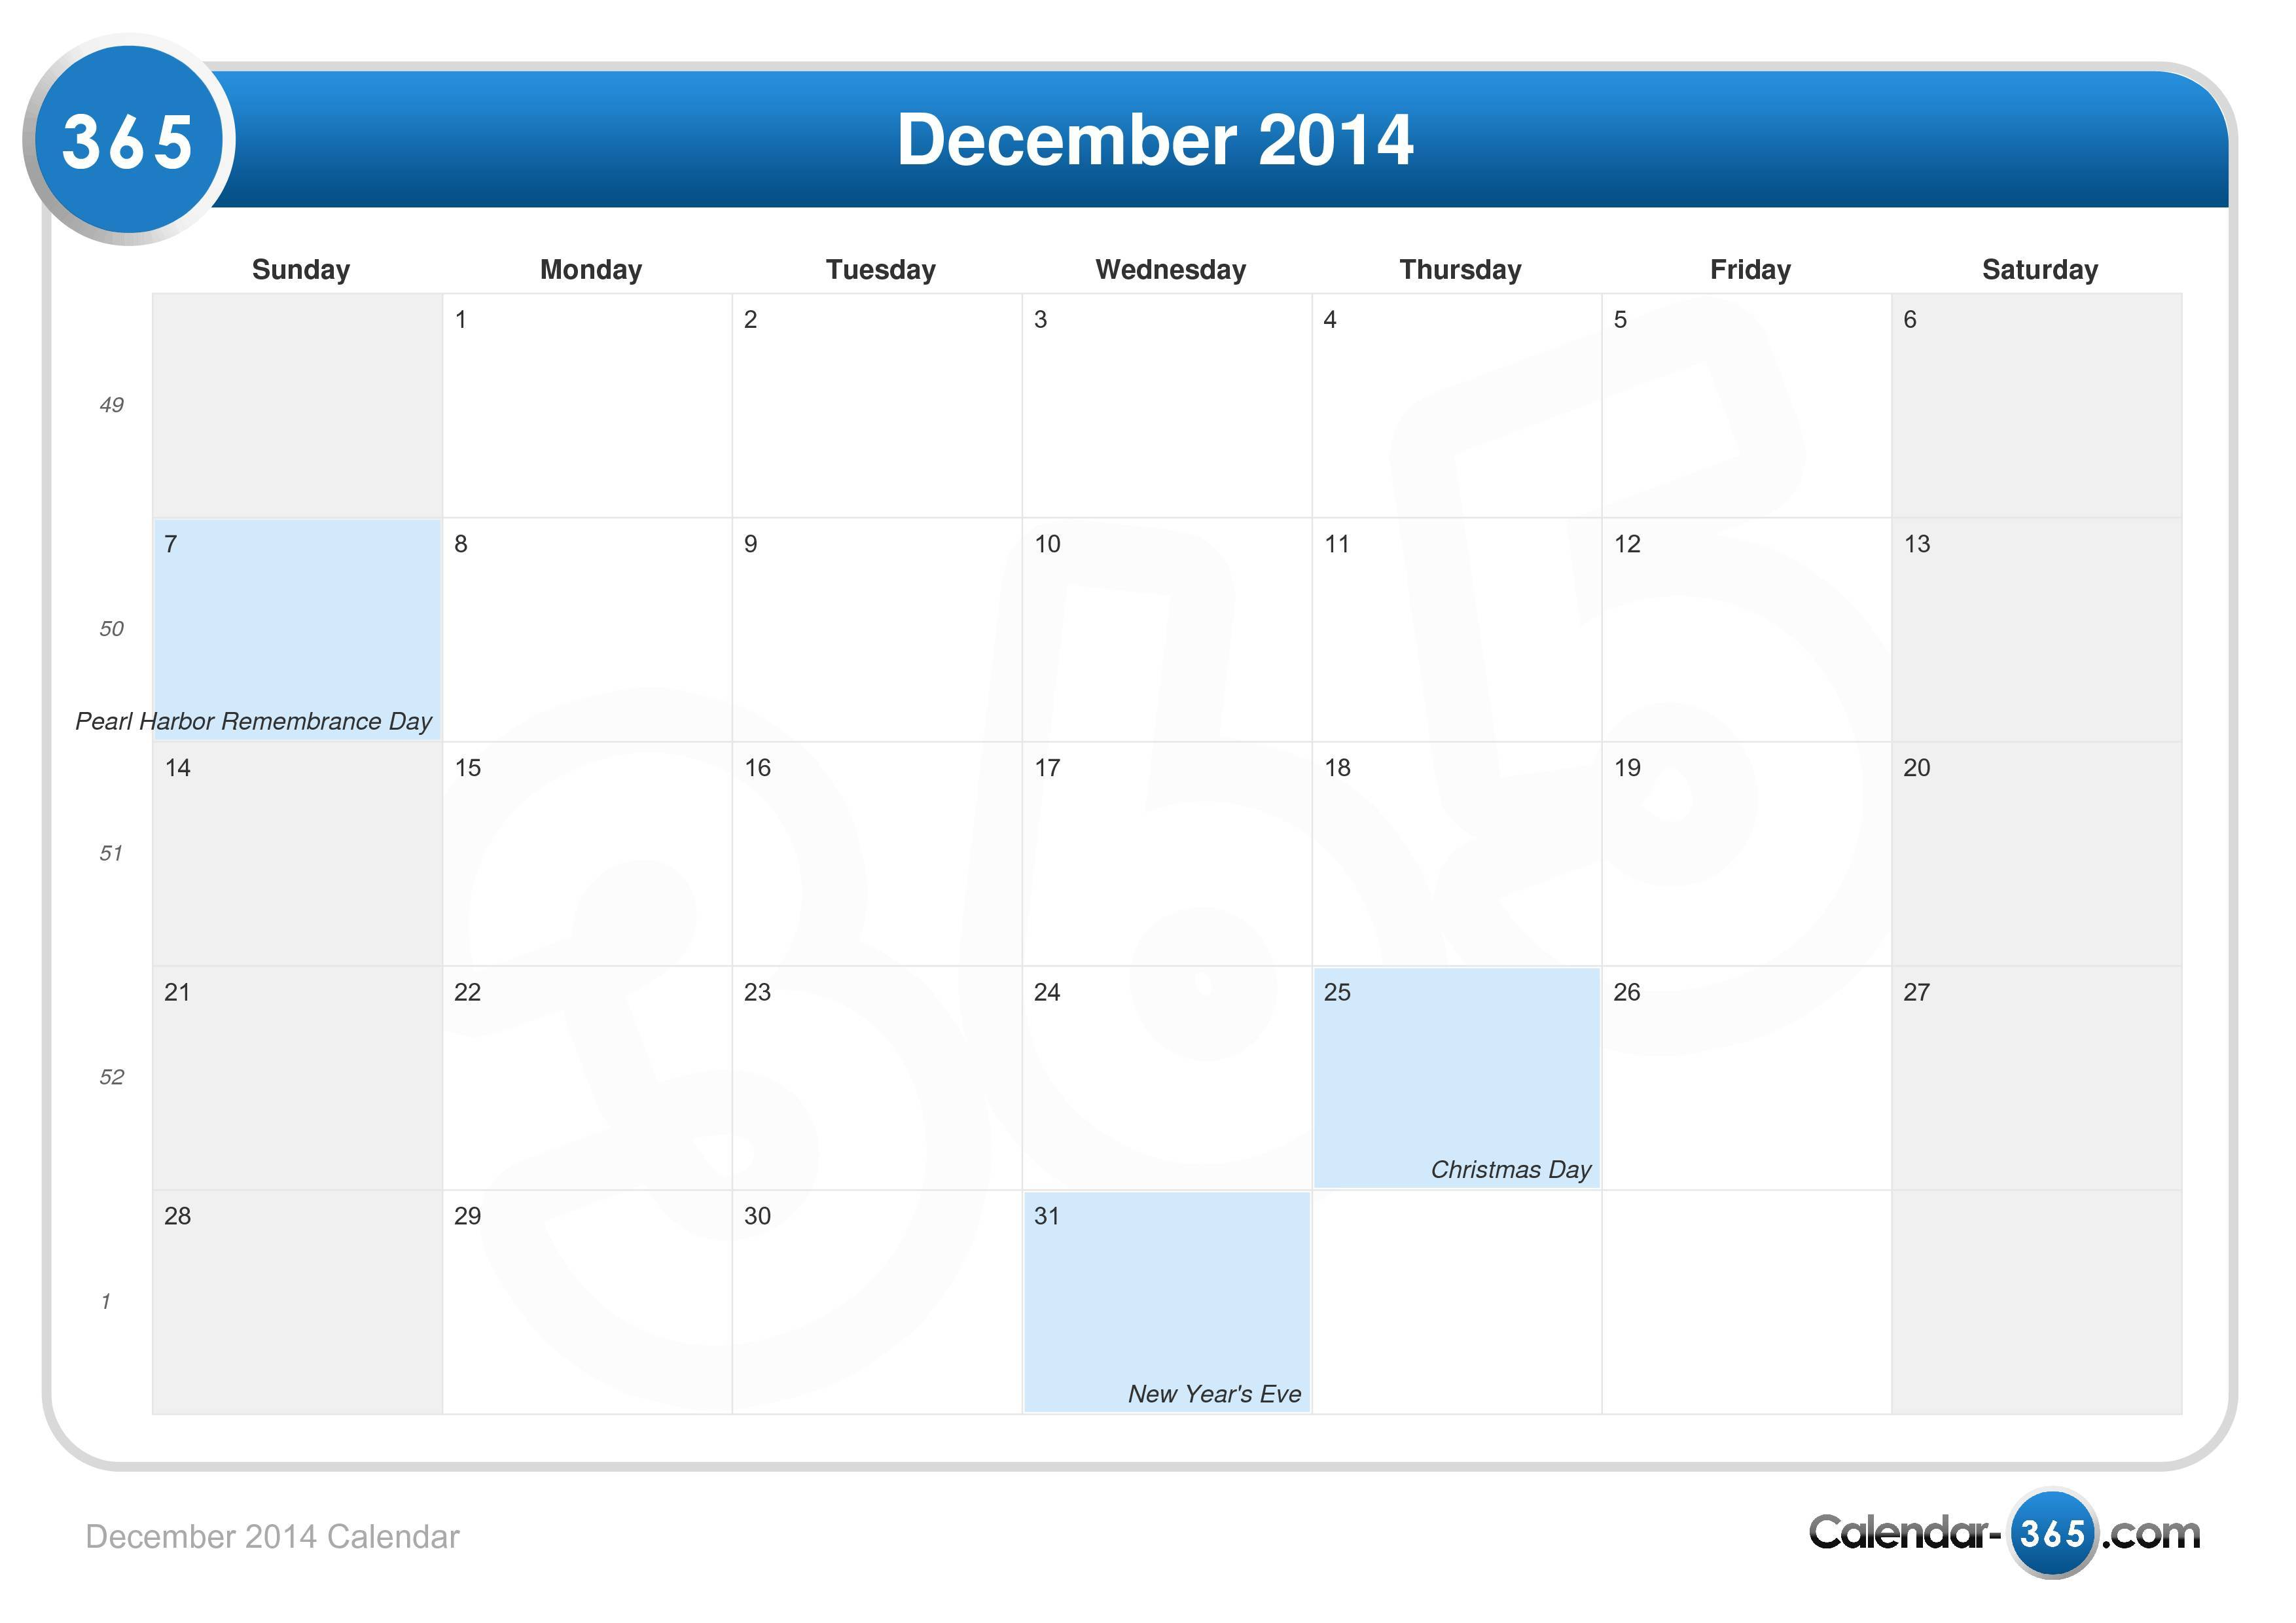 December Calendar 2014 : December calendar